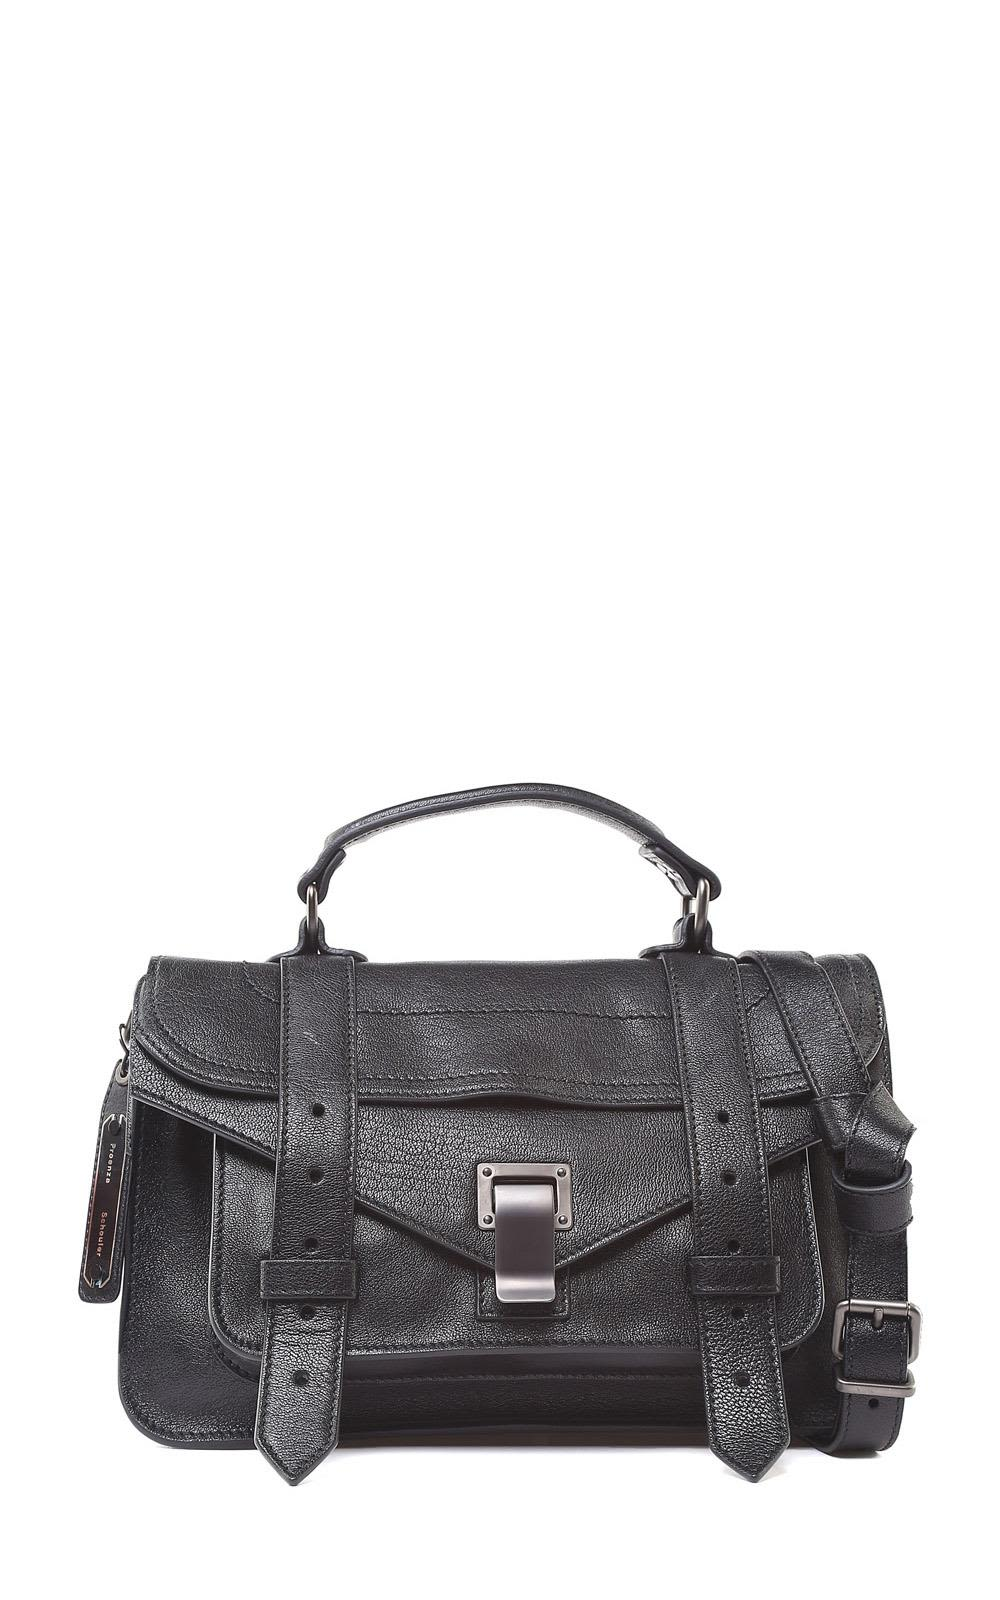 Proenza Schouler Ps1+Tiny Leather Shoulder Bag In Nero   ModeSens 679a09e633